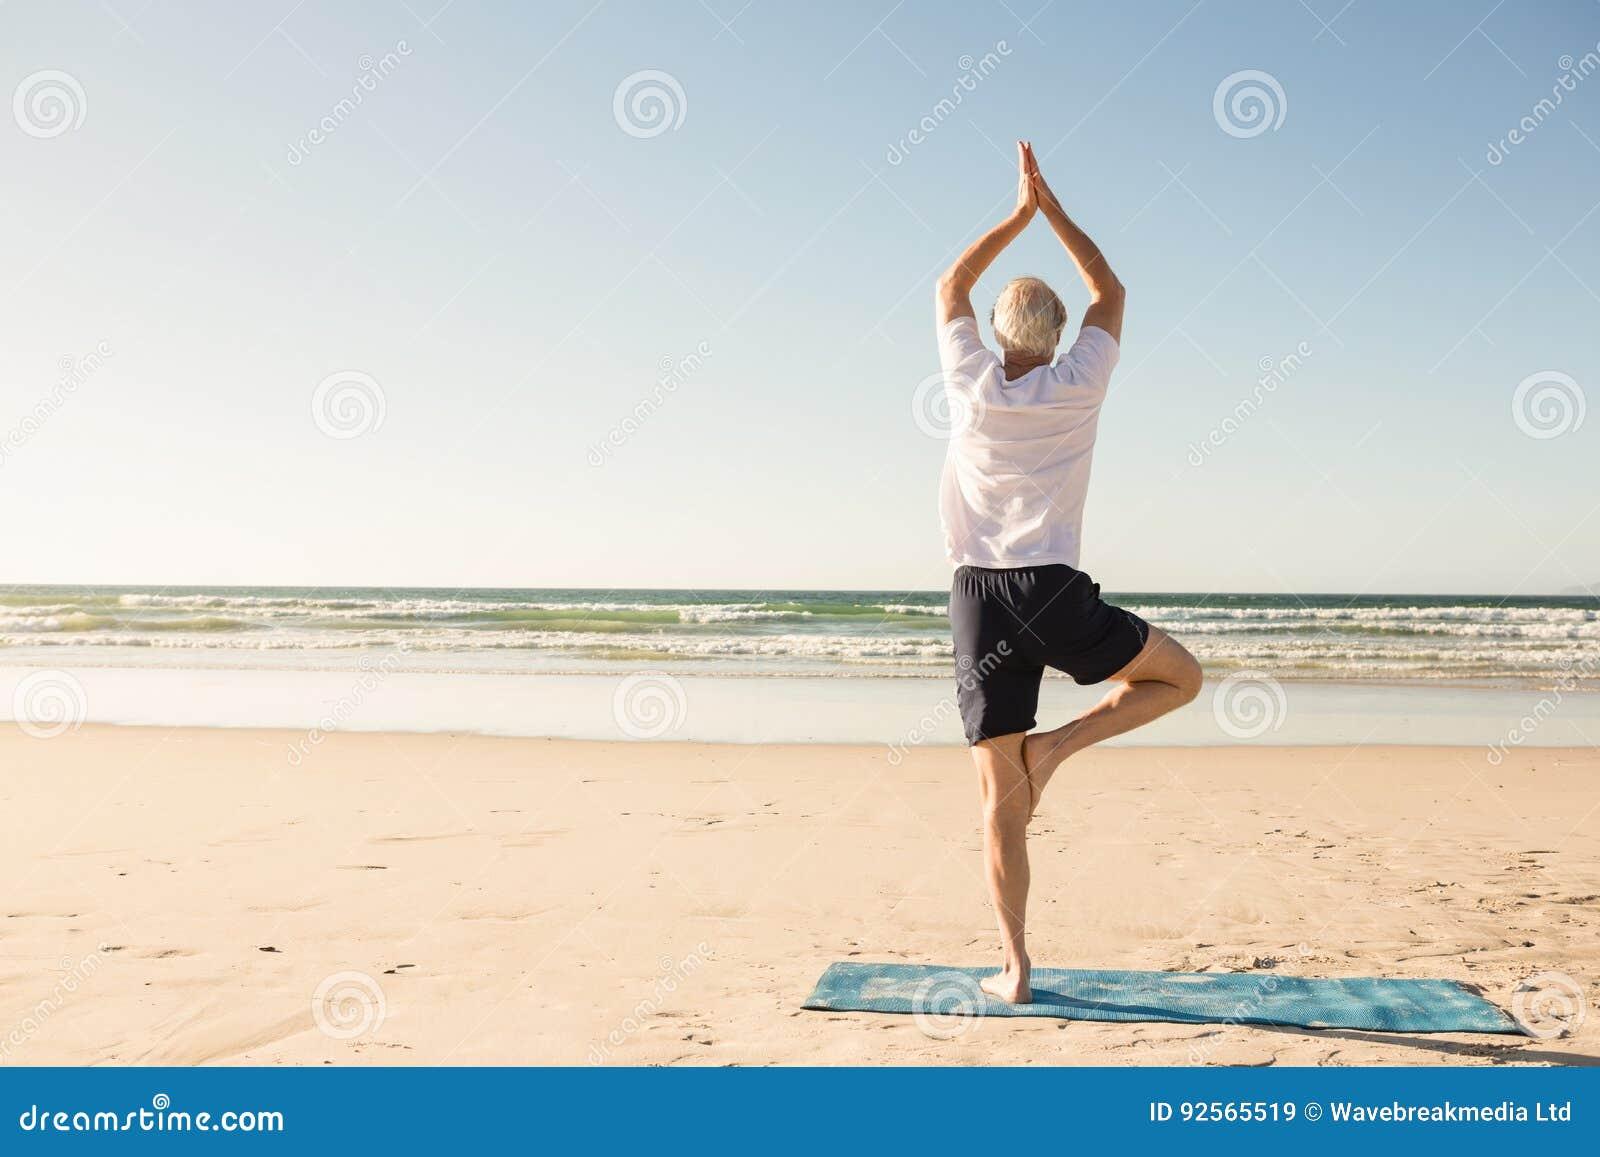 Rear view of senior man practicing tree pose at beach